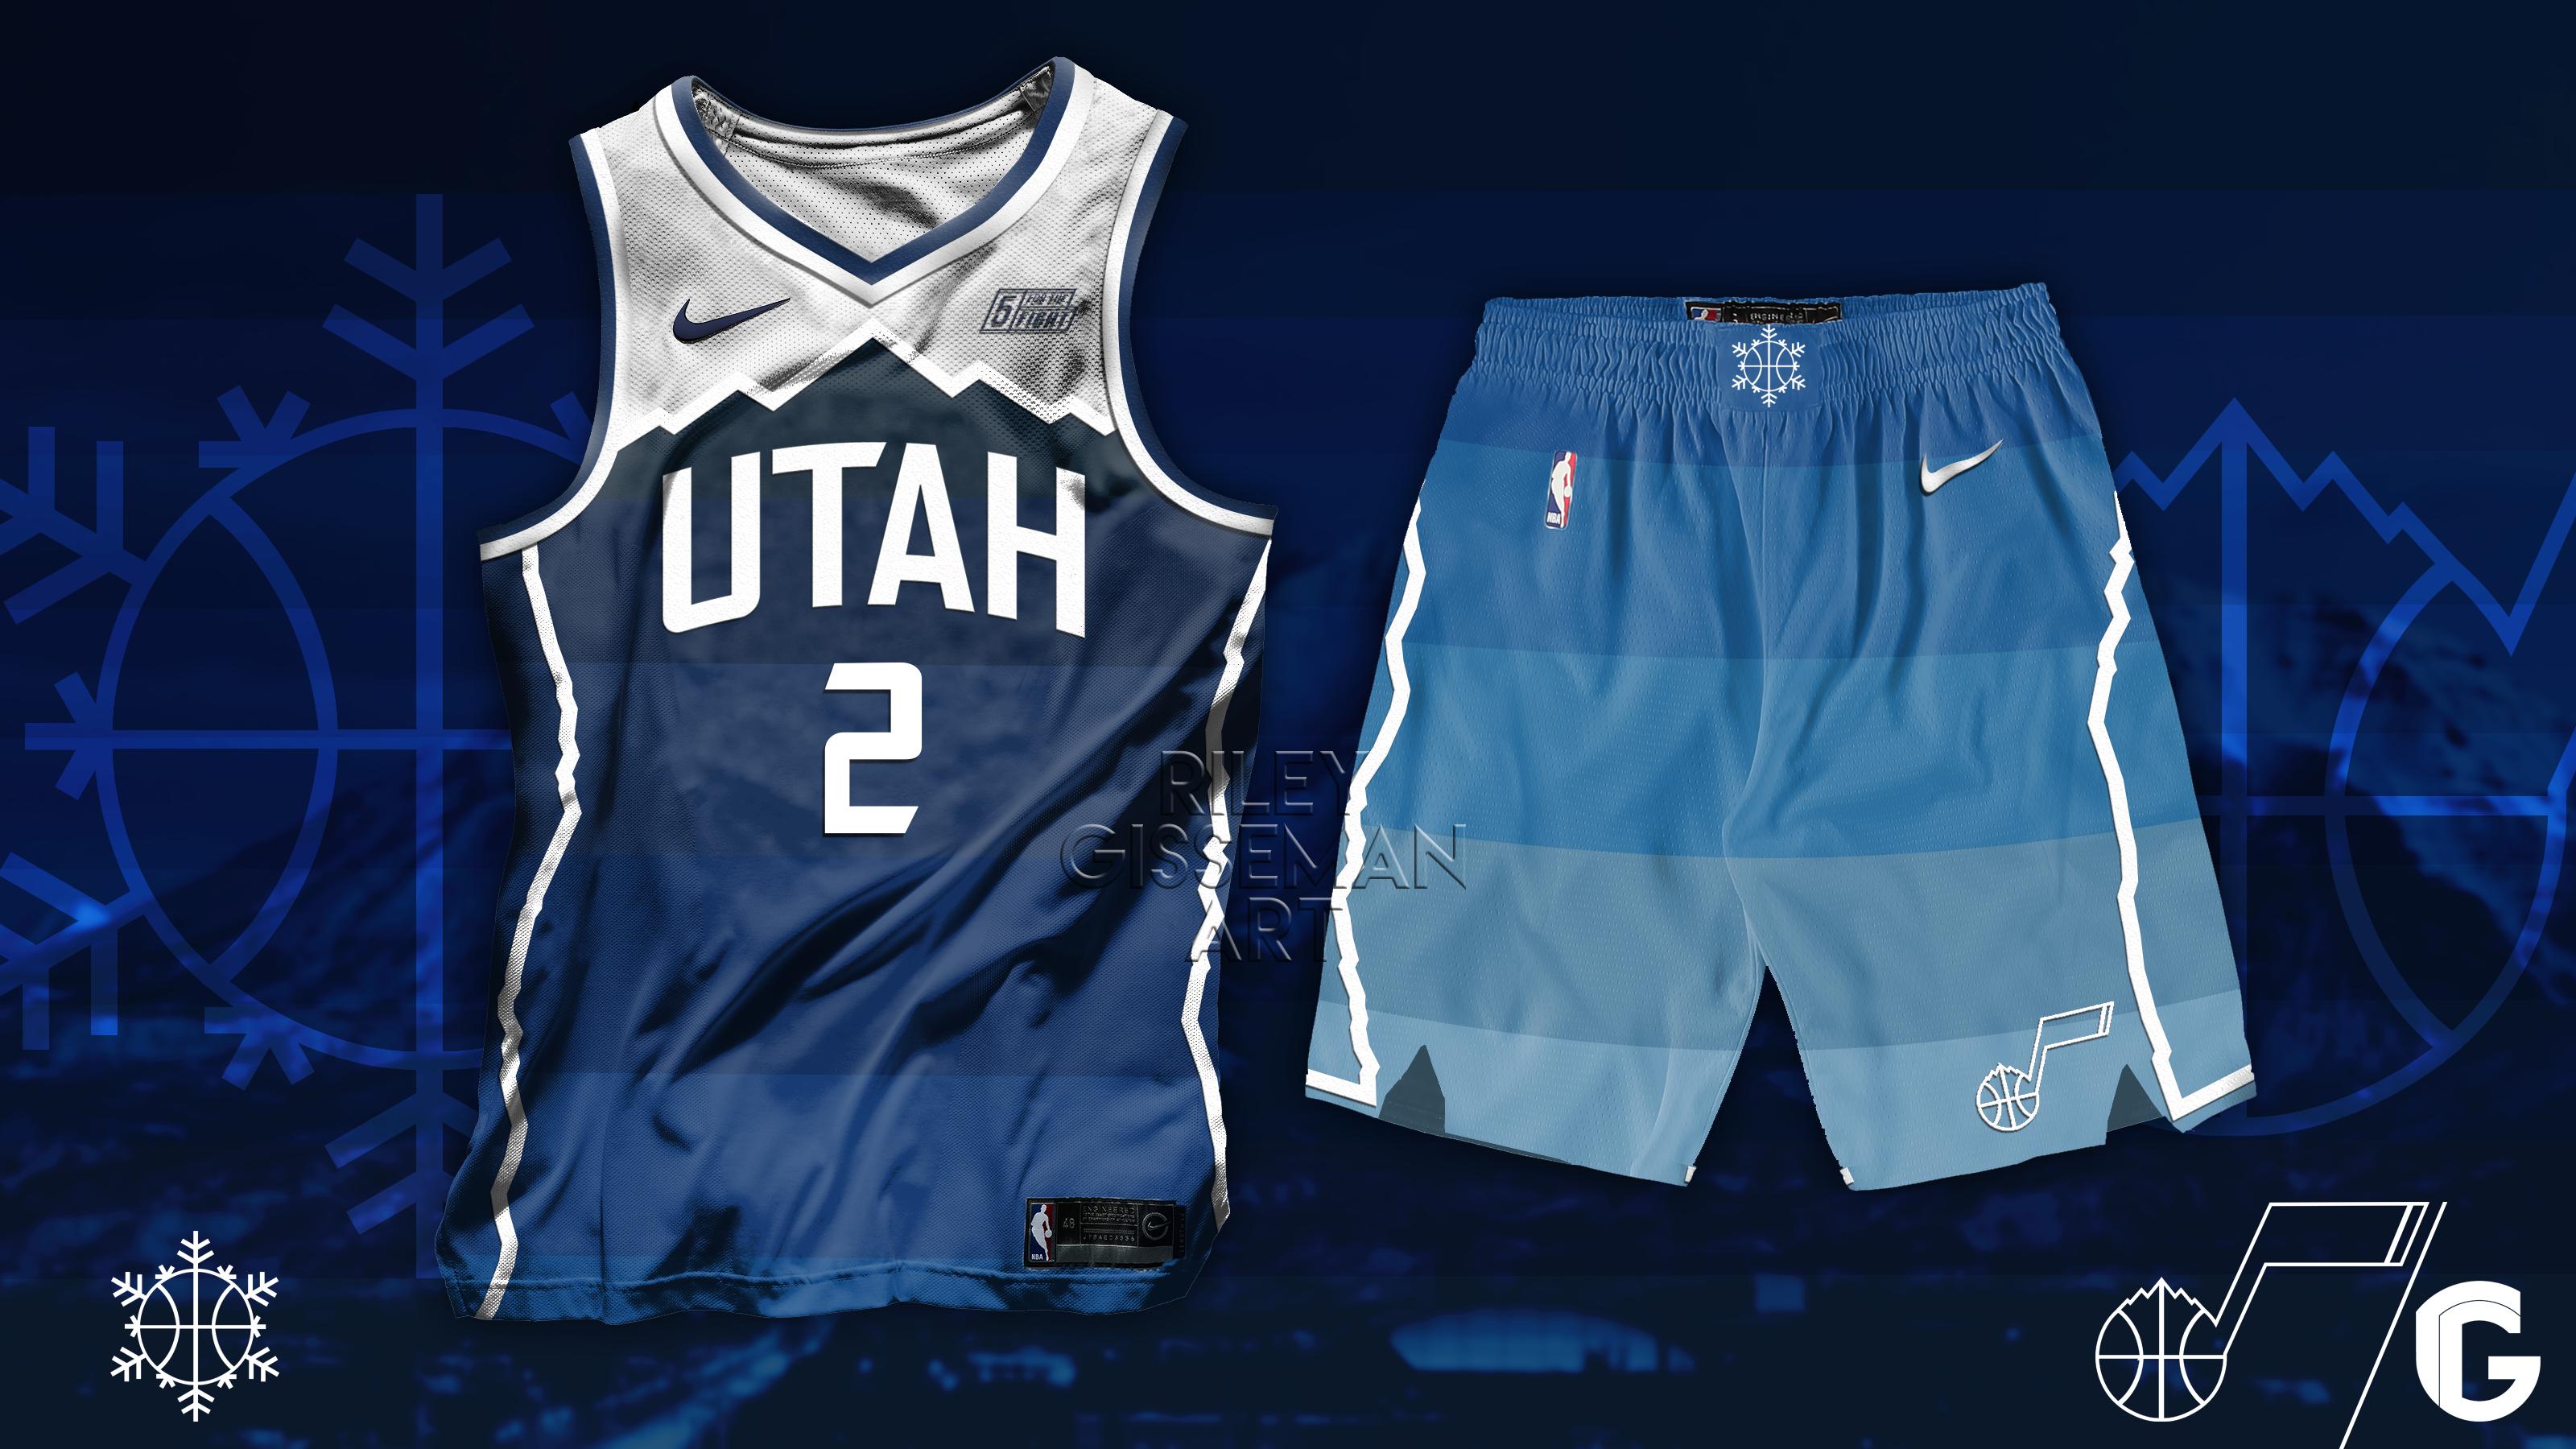 4548e22167a5 2019 Nike-Utah Jazz Concept